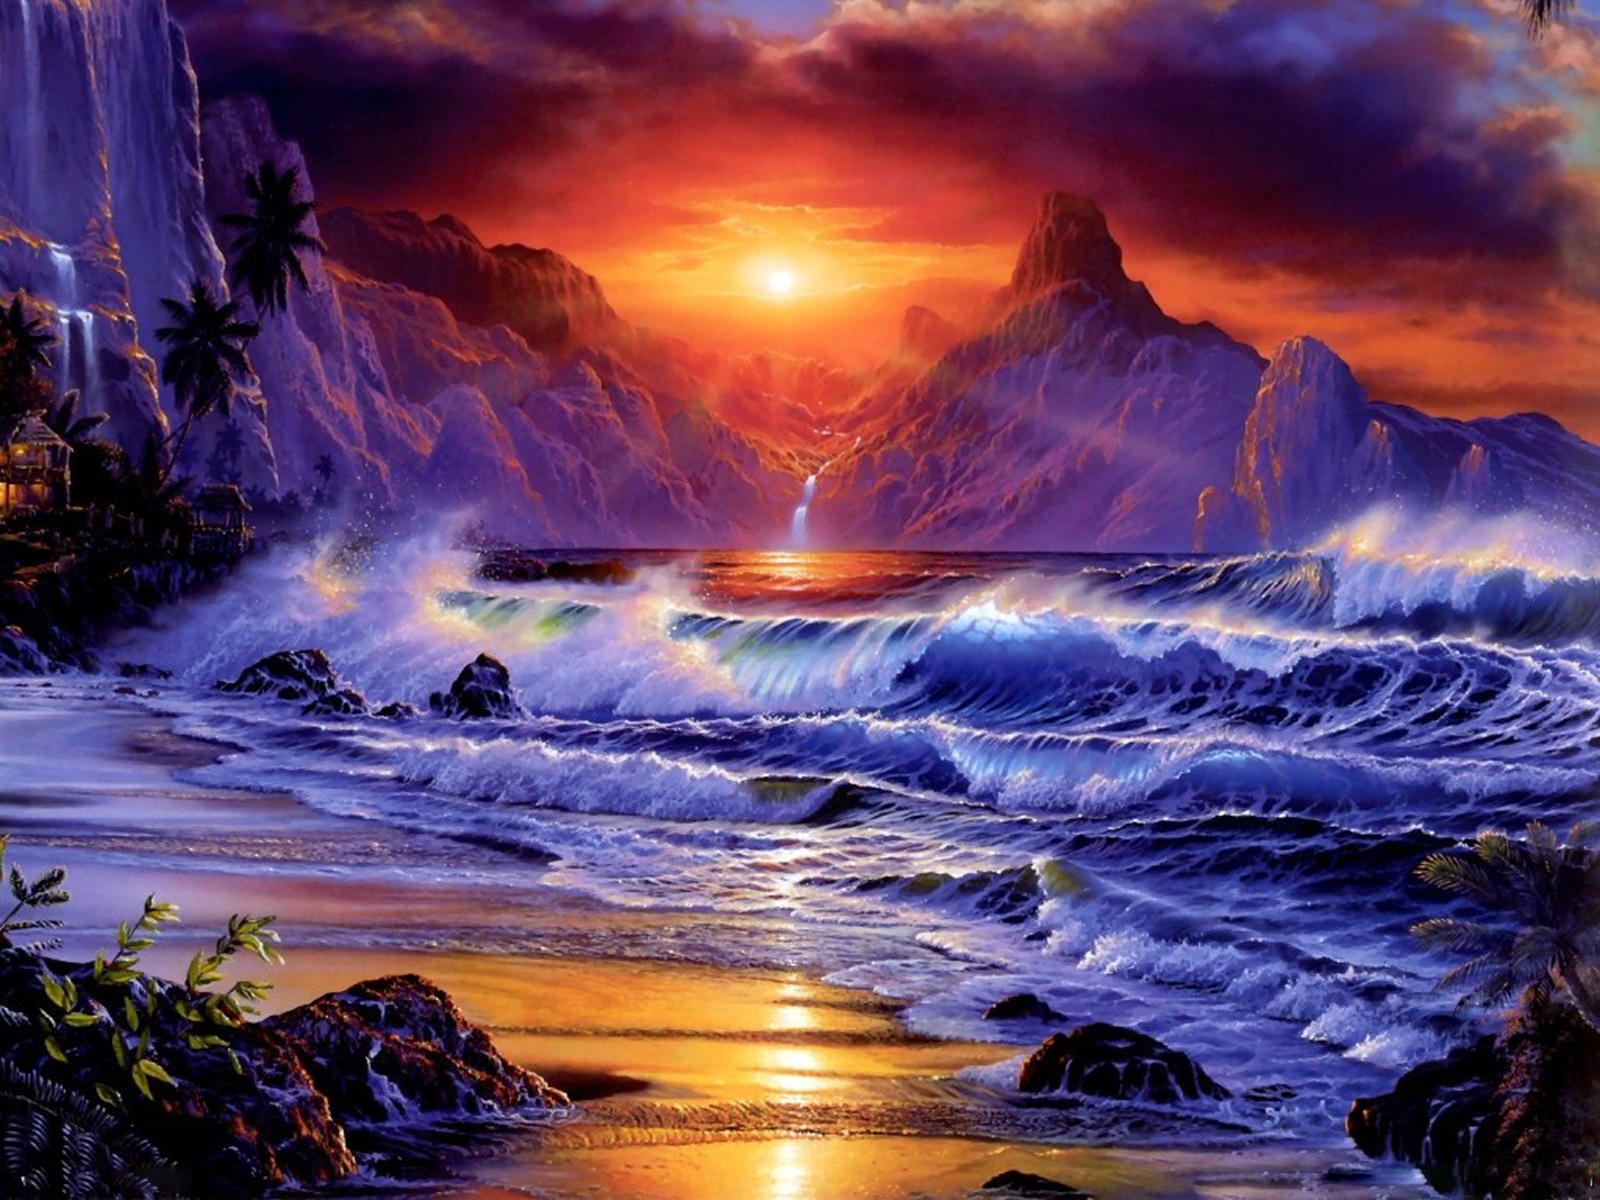 size 1600x1200 desktop wallpaper of amazing fantasy sunset 1600x1200